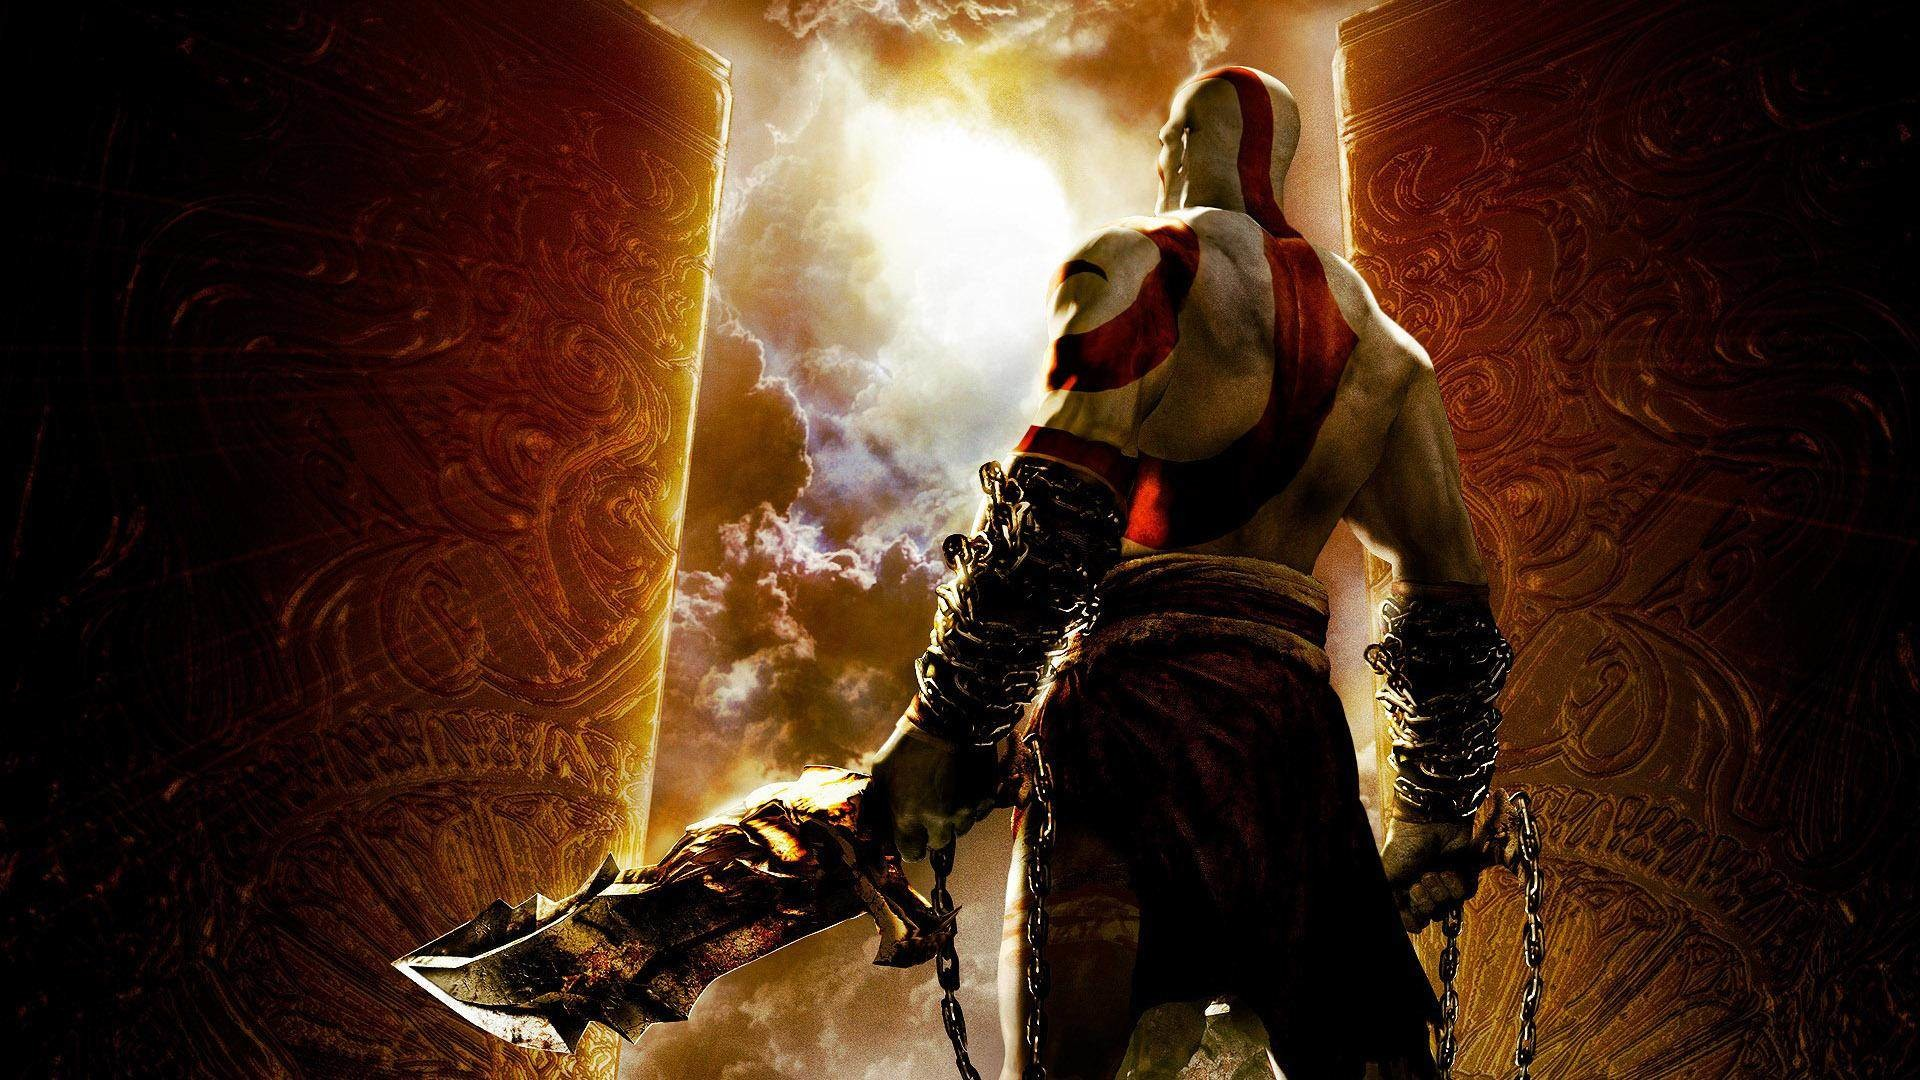 of Games God War Kratos god of war Kratos HD Wallpapers, Desktop 1920×1080